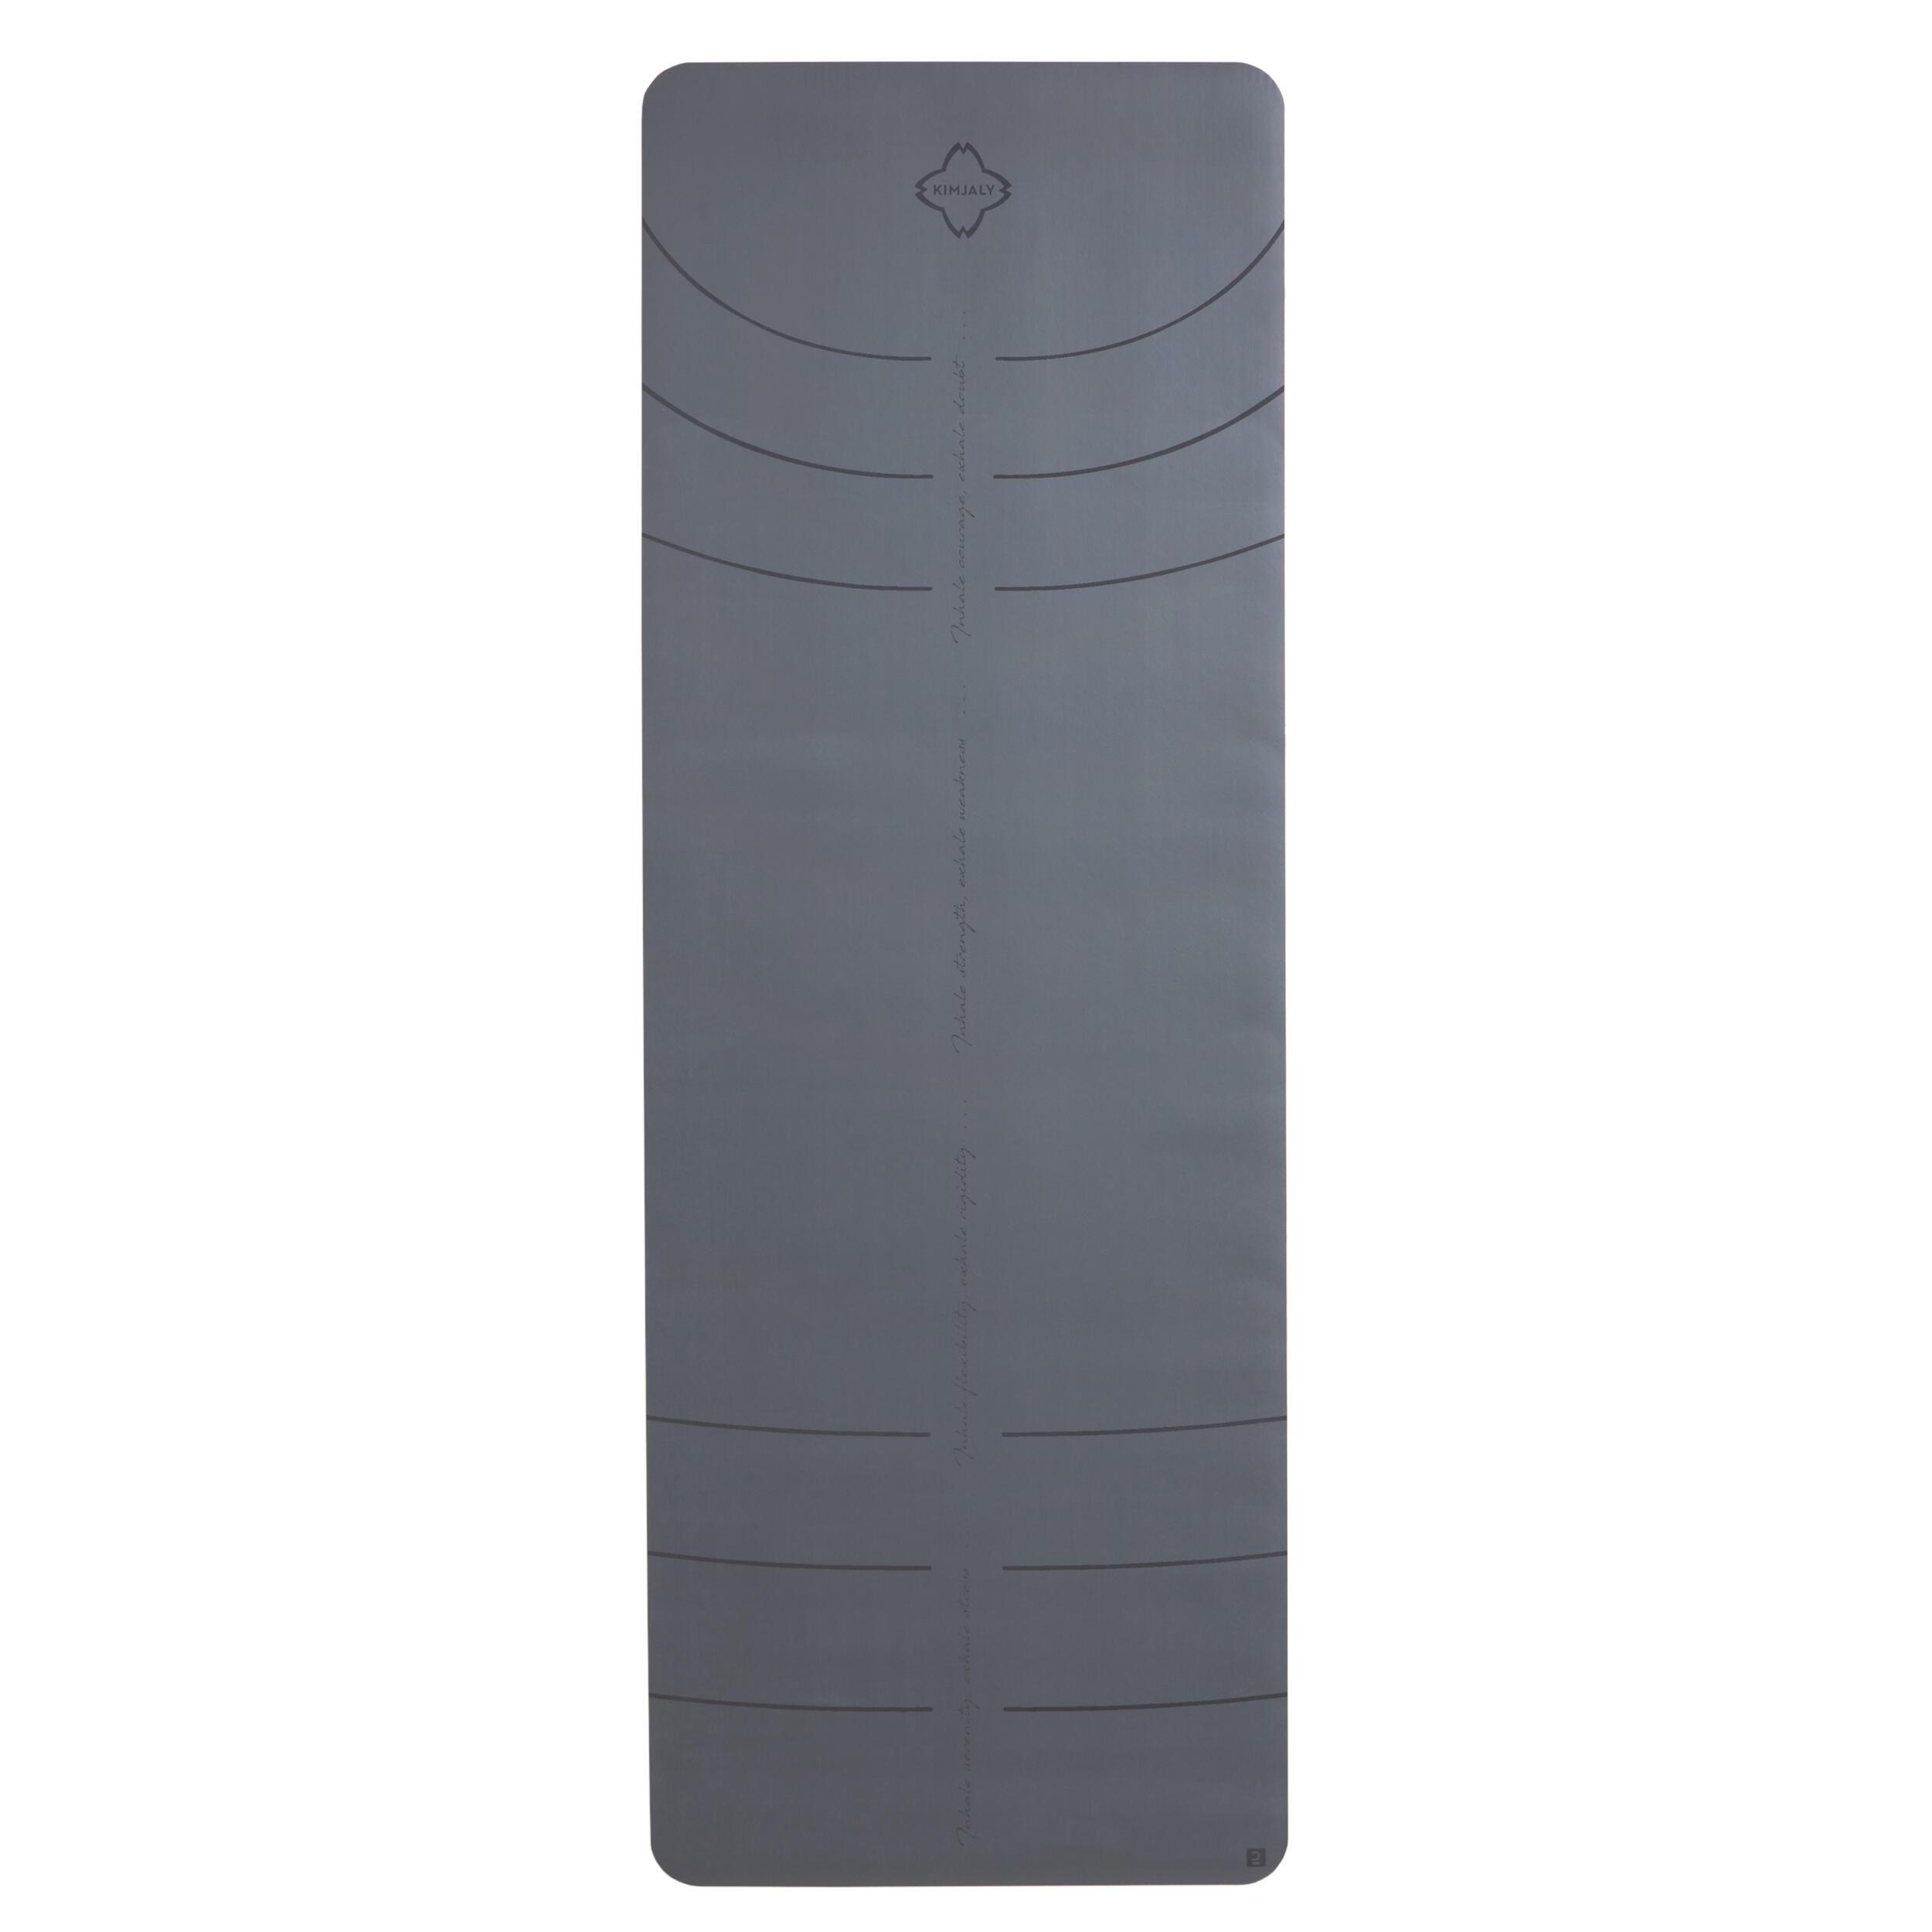 Saltea Yoga Grip+ 5mm Gri imagine